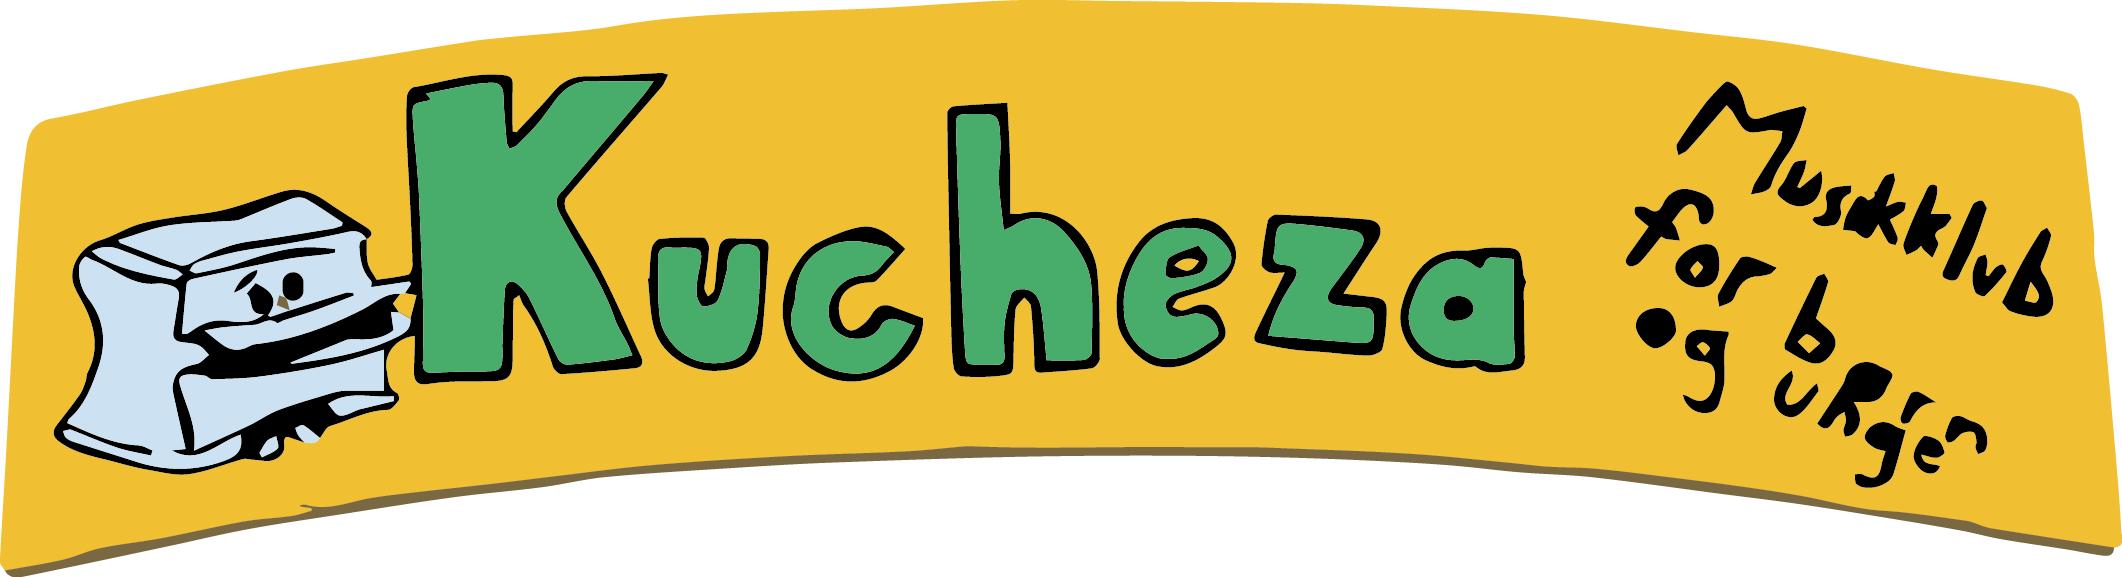 Kucheza logo 1